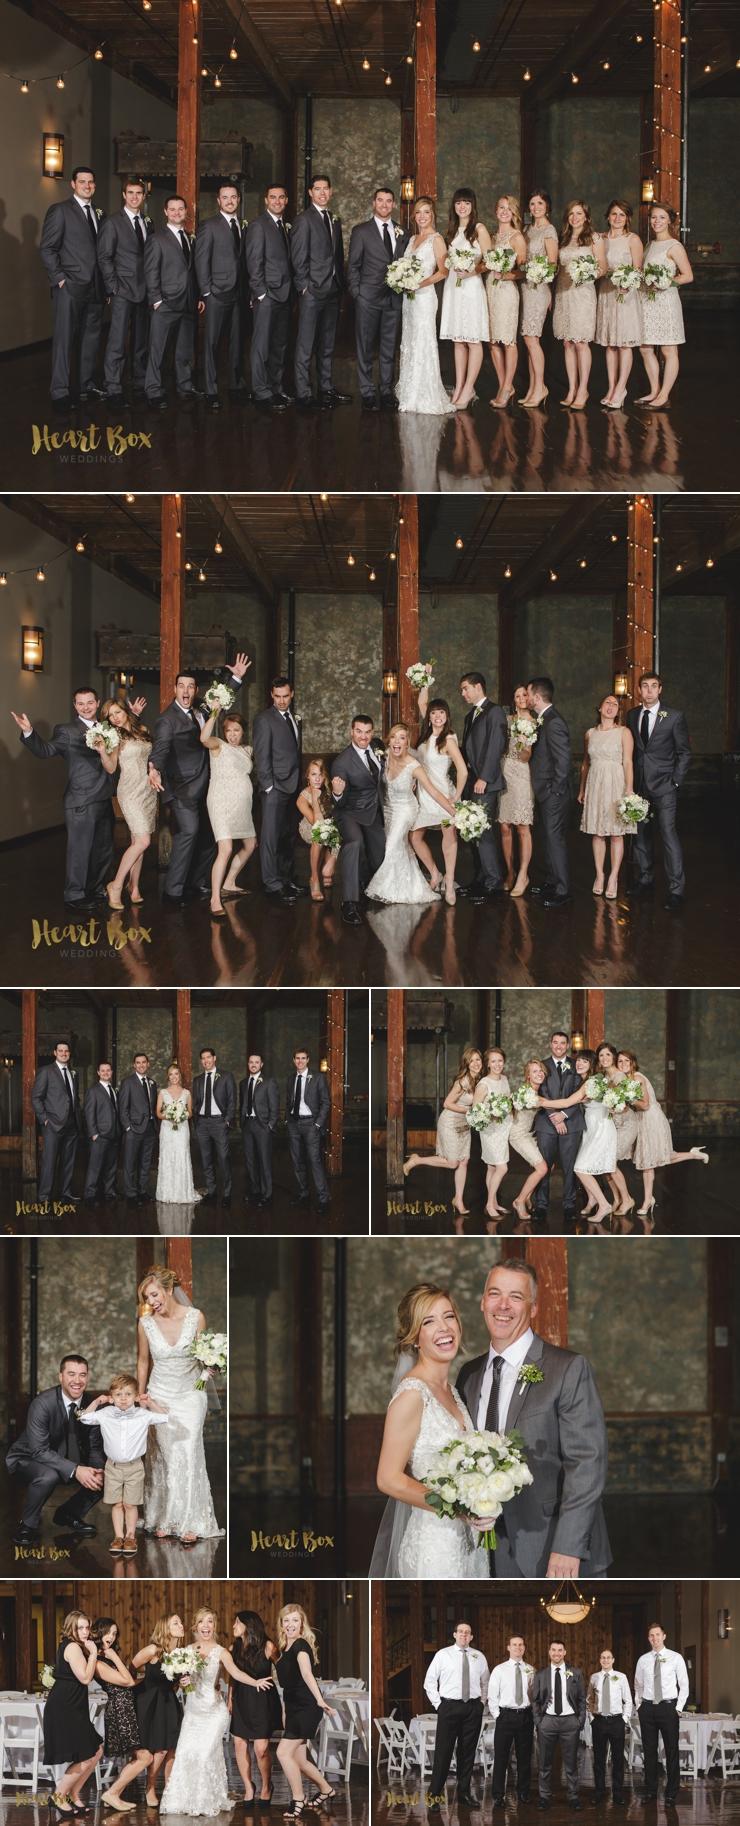 Popplewell Wedding Blog Collages 16.jpg